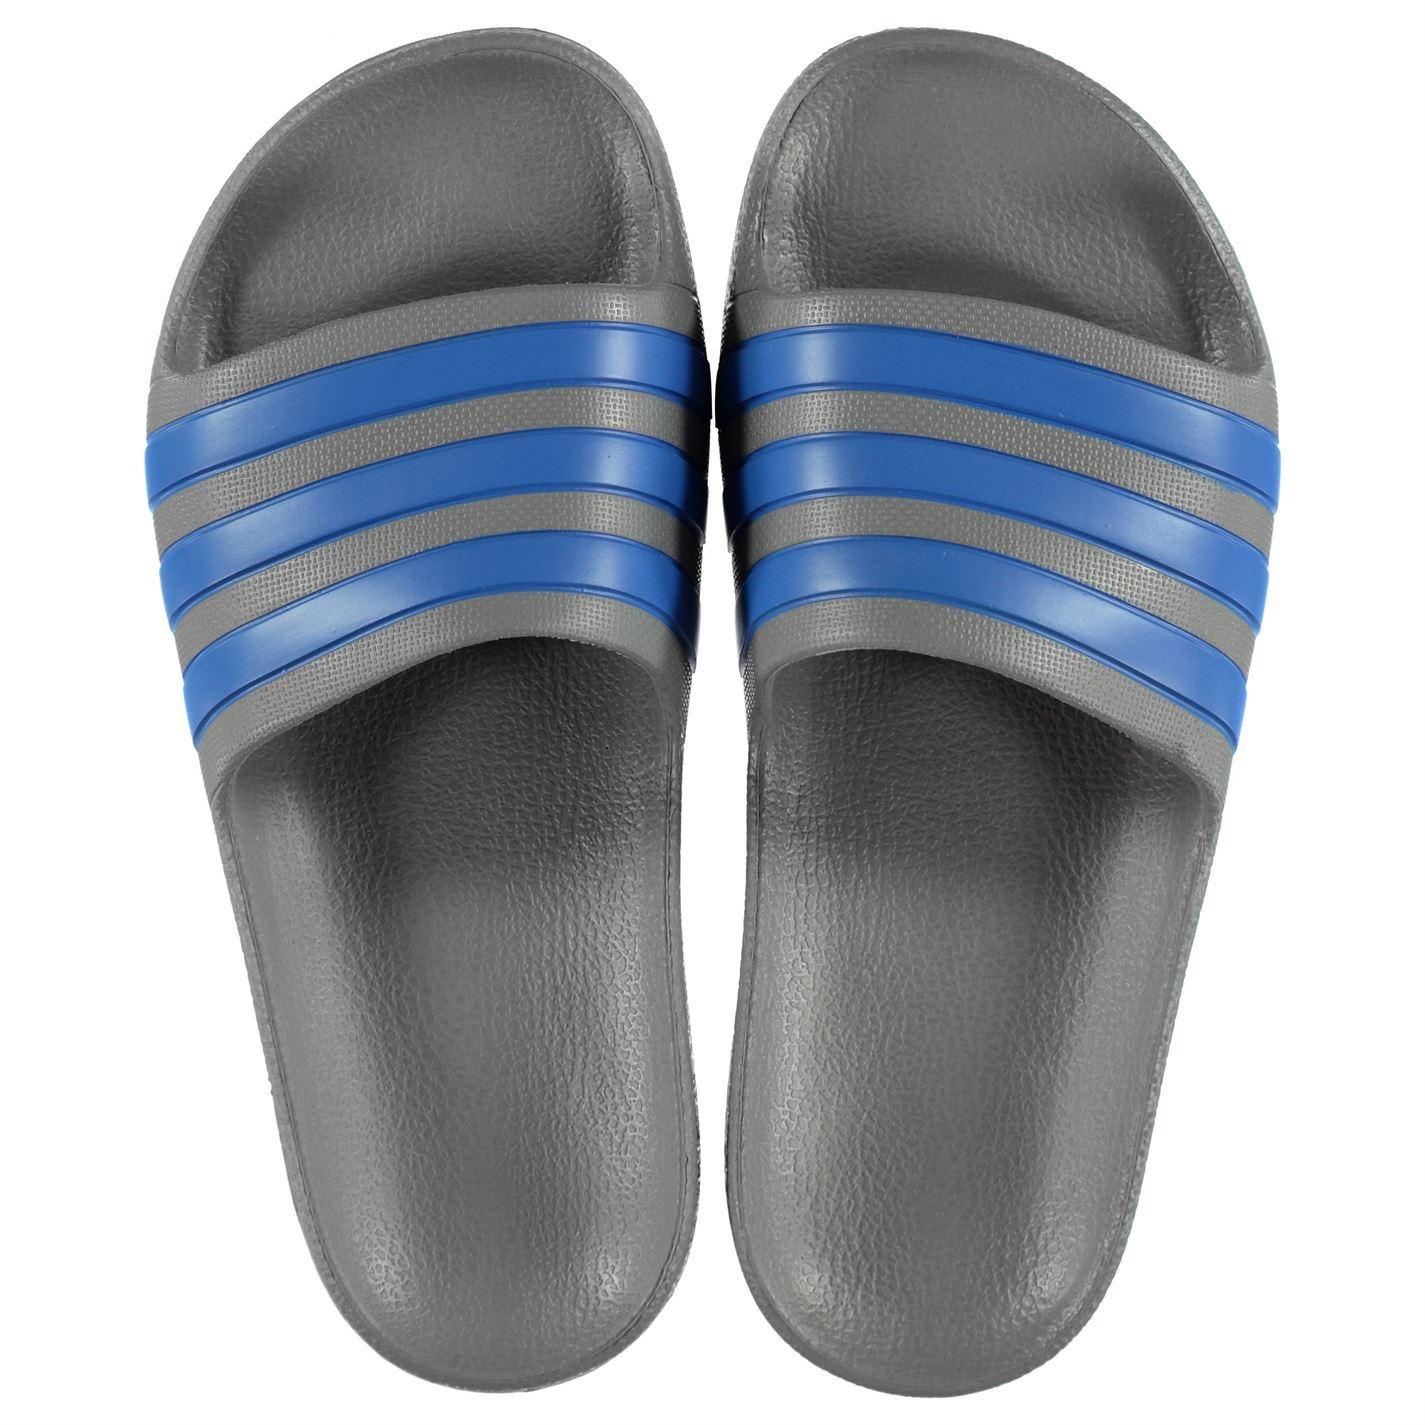 miniatura 18 - ADIDAS-Duramo-Slide-Piscina-Scarpe-Bambino-Ragazzo-Sandali-Infradito-Spiaggia-Scarpe-Thongs